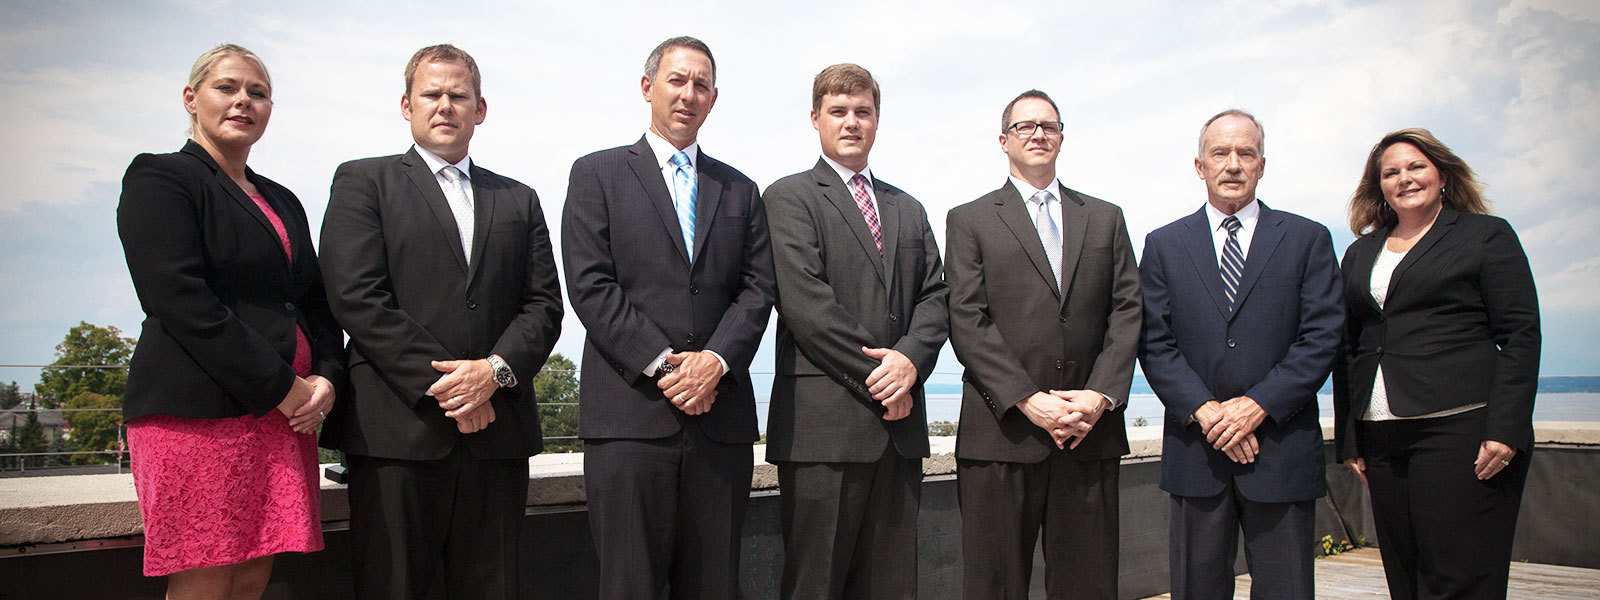 Attorney Grayling MI